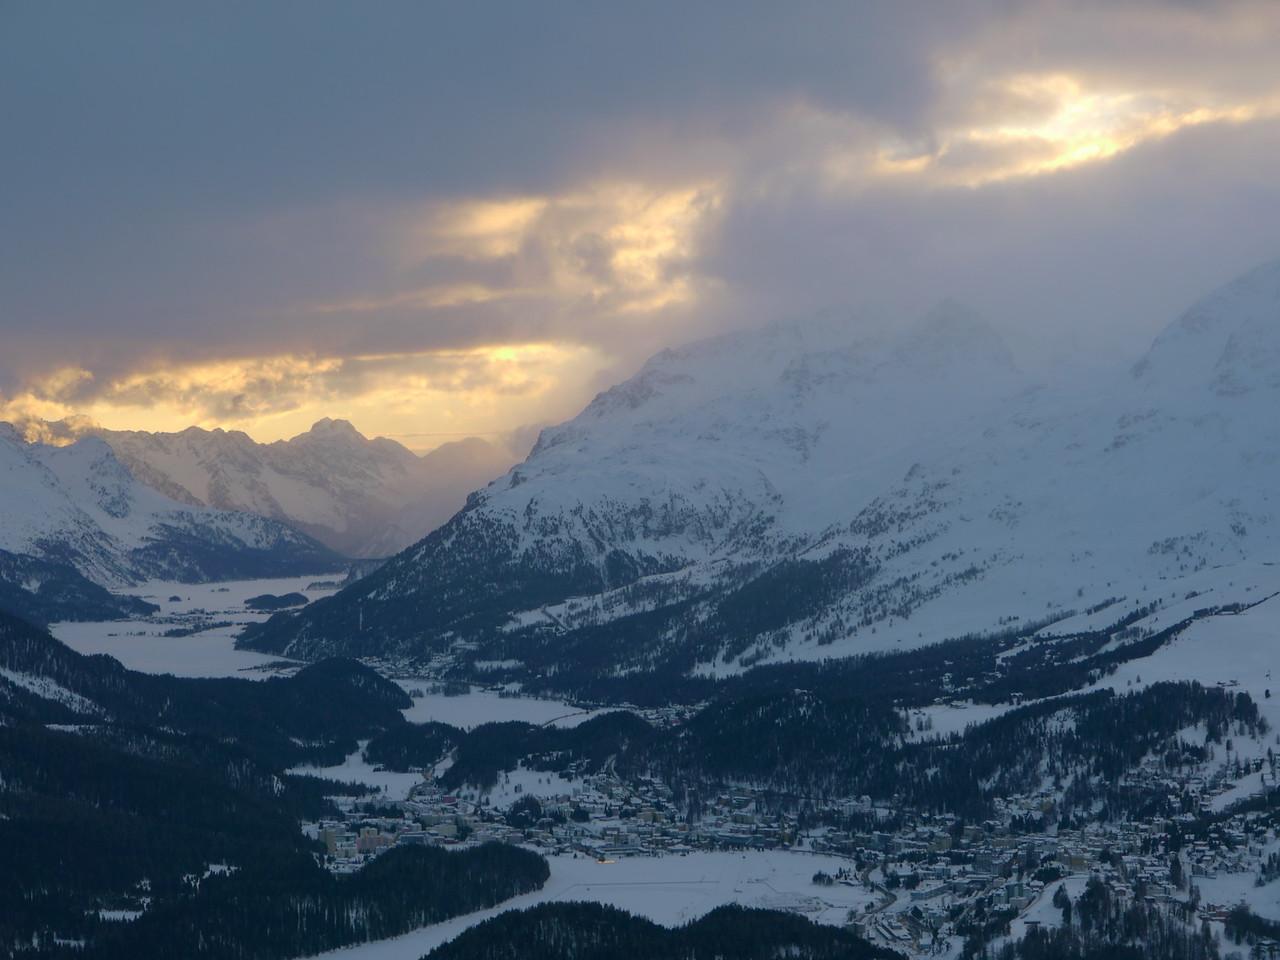 @RobAng 2013 / Muotas Muragl, Samedan/St.Moritz, Kanton Graubünden, CHE, Schweiz, 2450 m ü/M, 2013/02/15 16:32:54